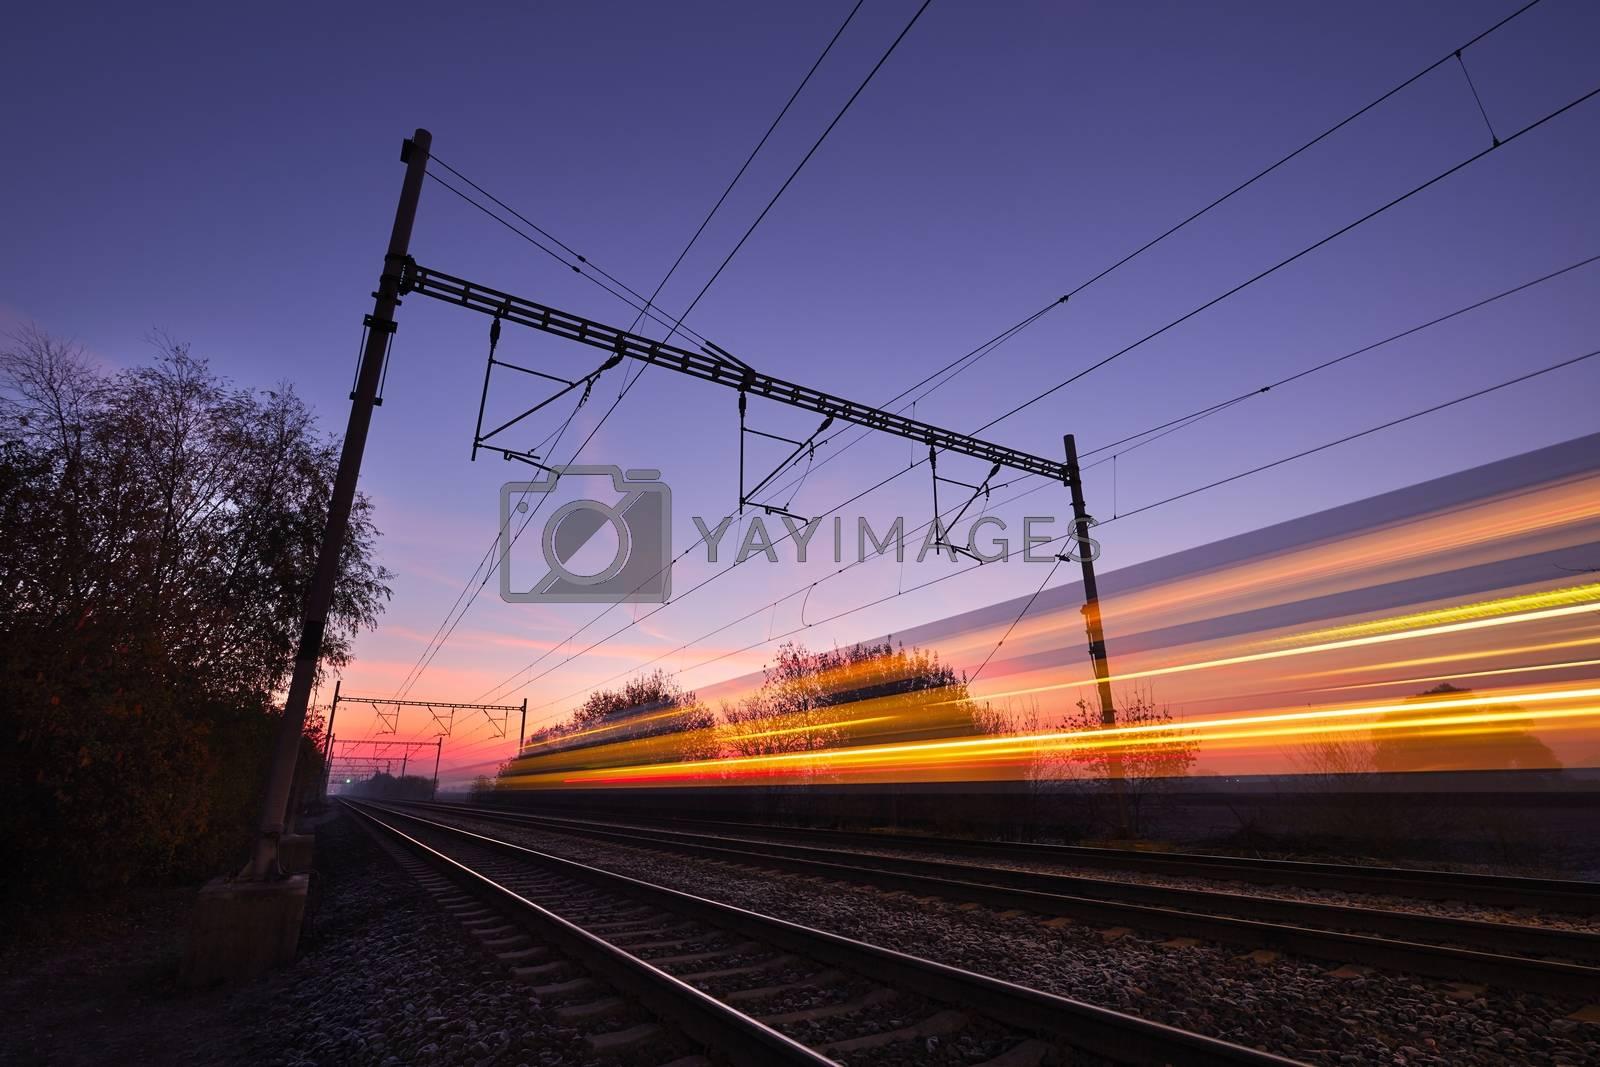 Passenger train on railroad tracks at the sunrise - blurred motion